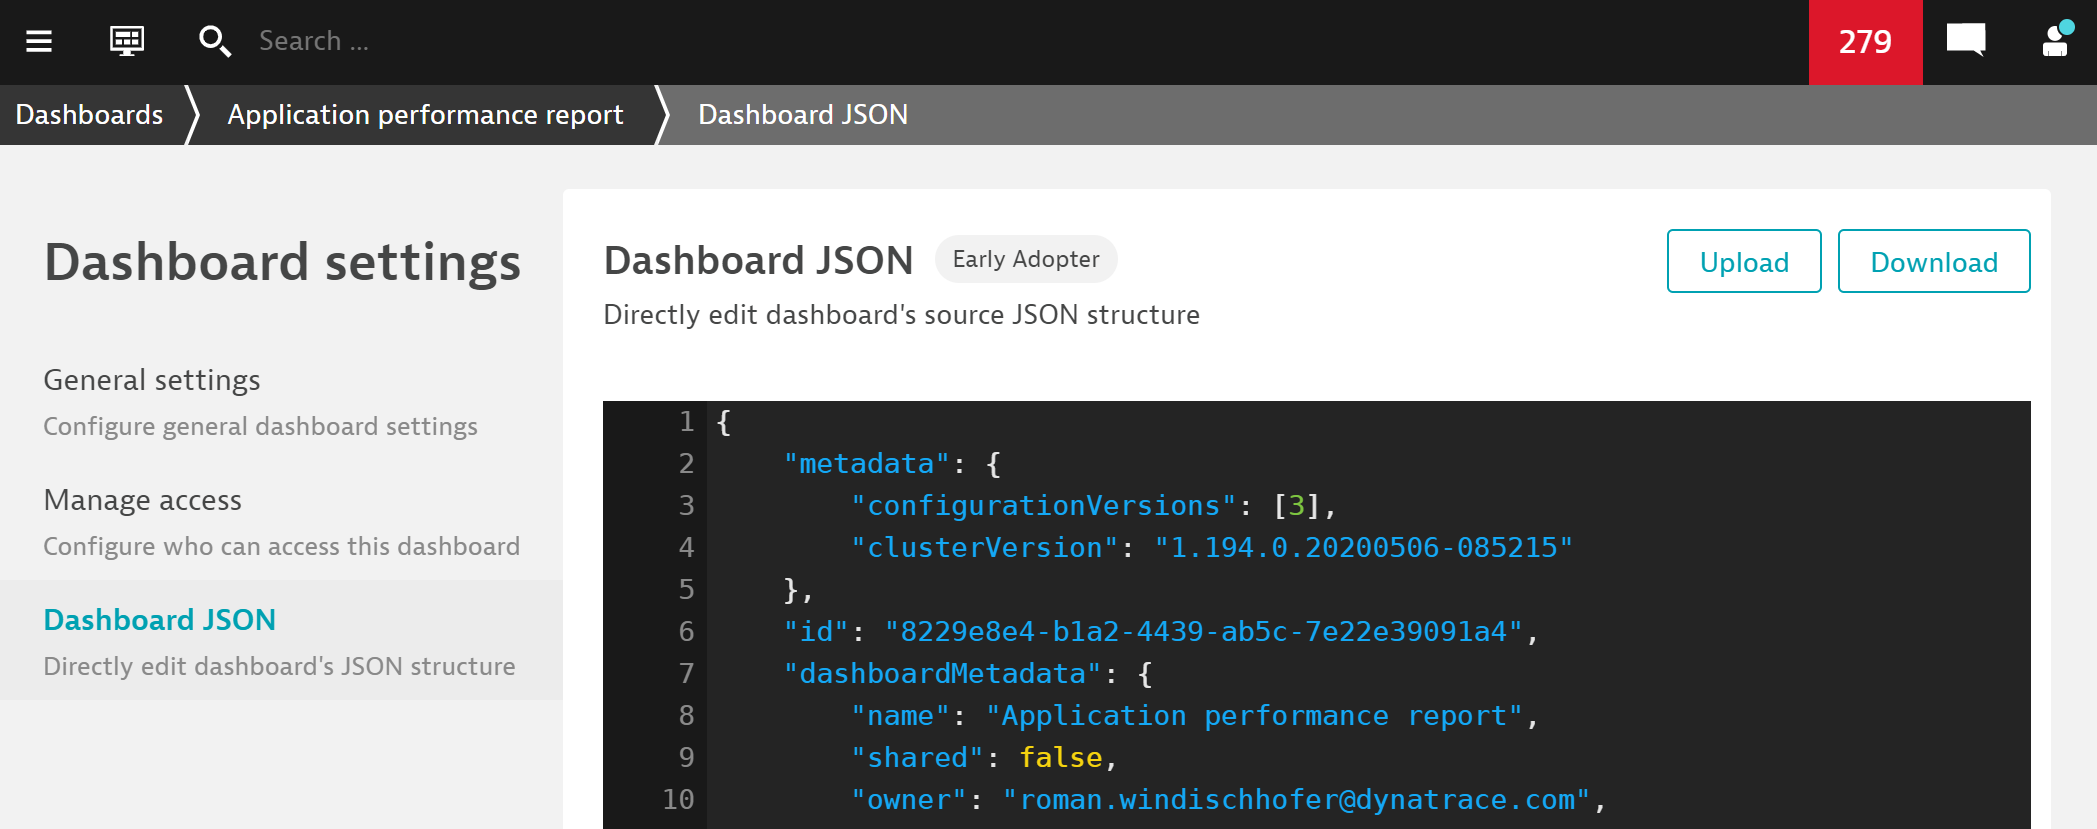 Dashboard JSON editor in advanced settings